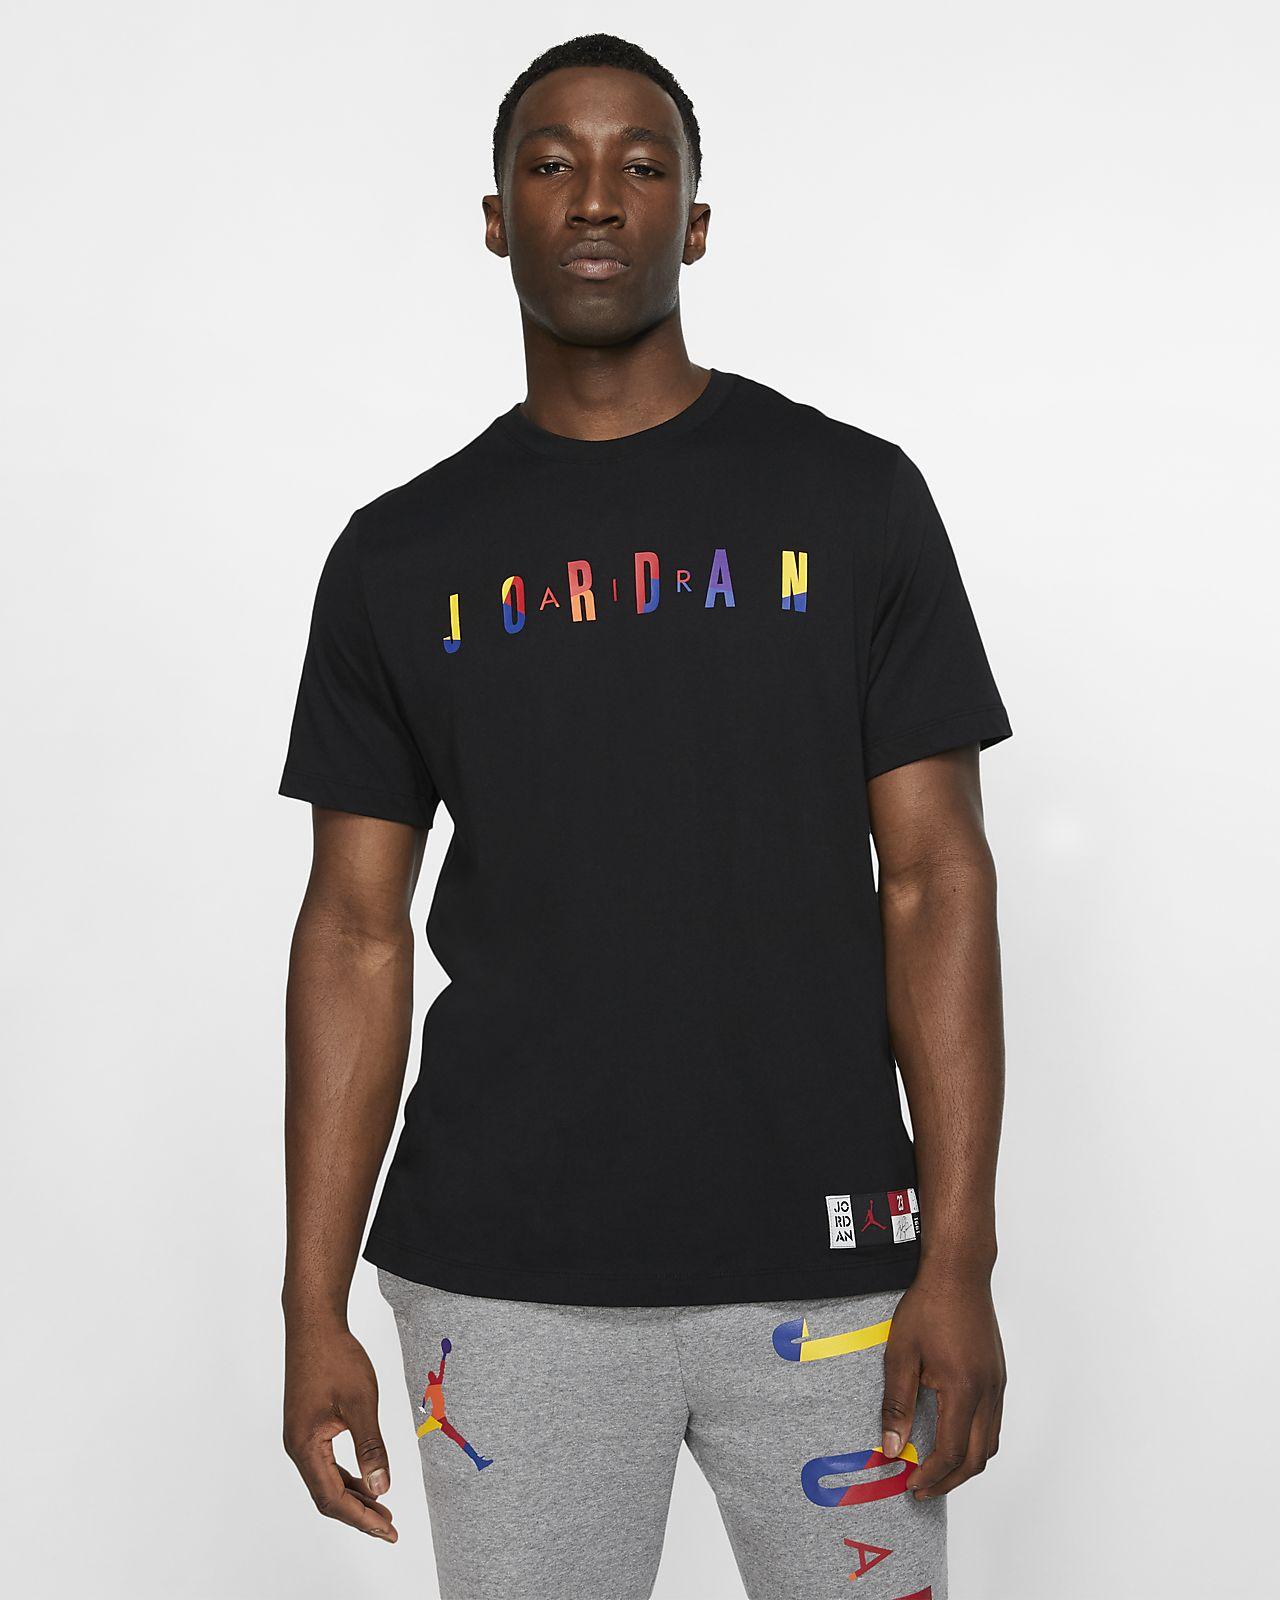 Playera para hombre Jordan DNA